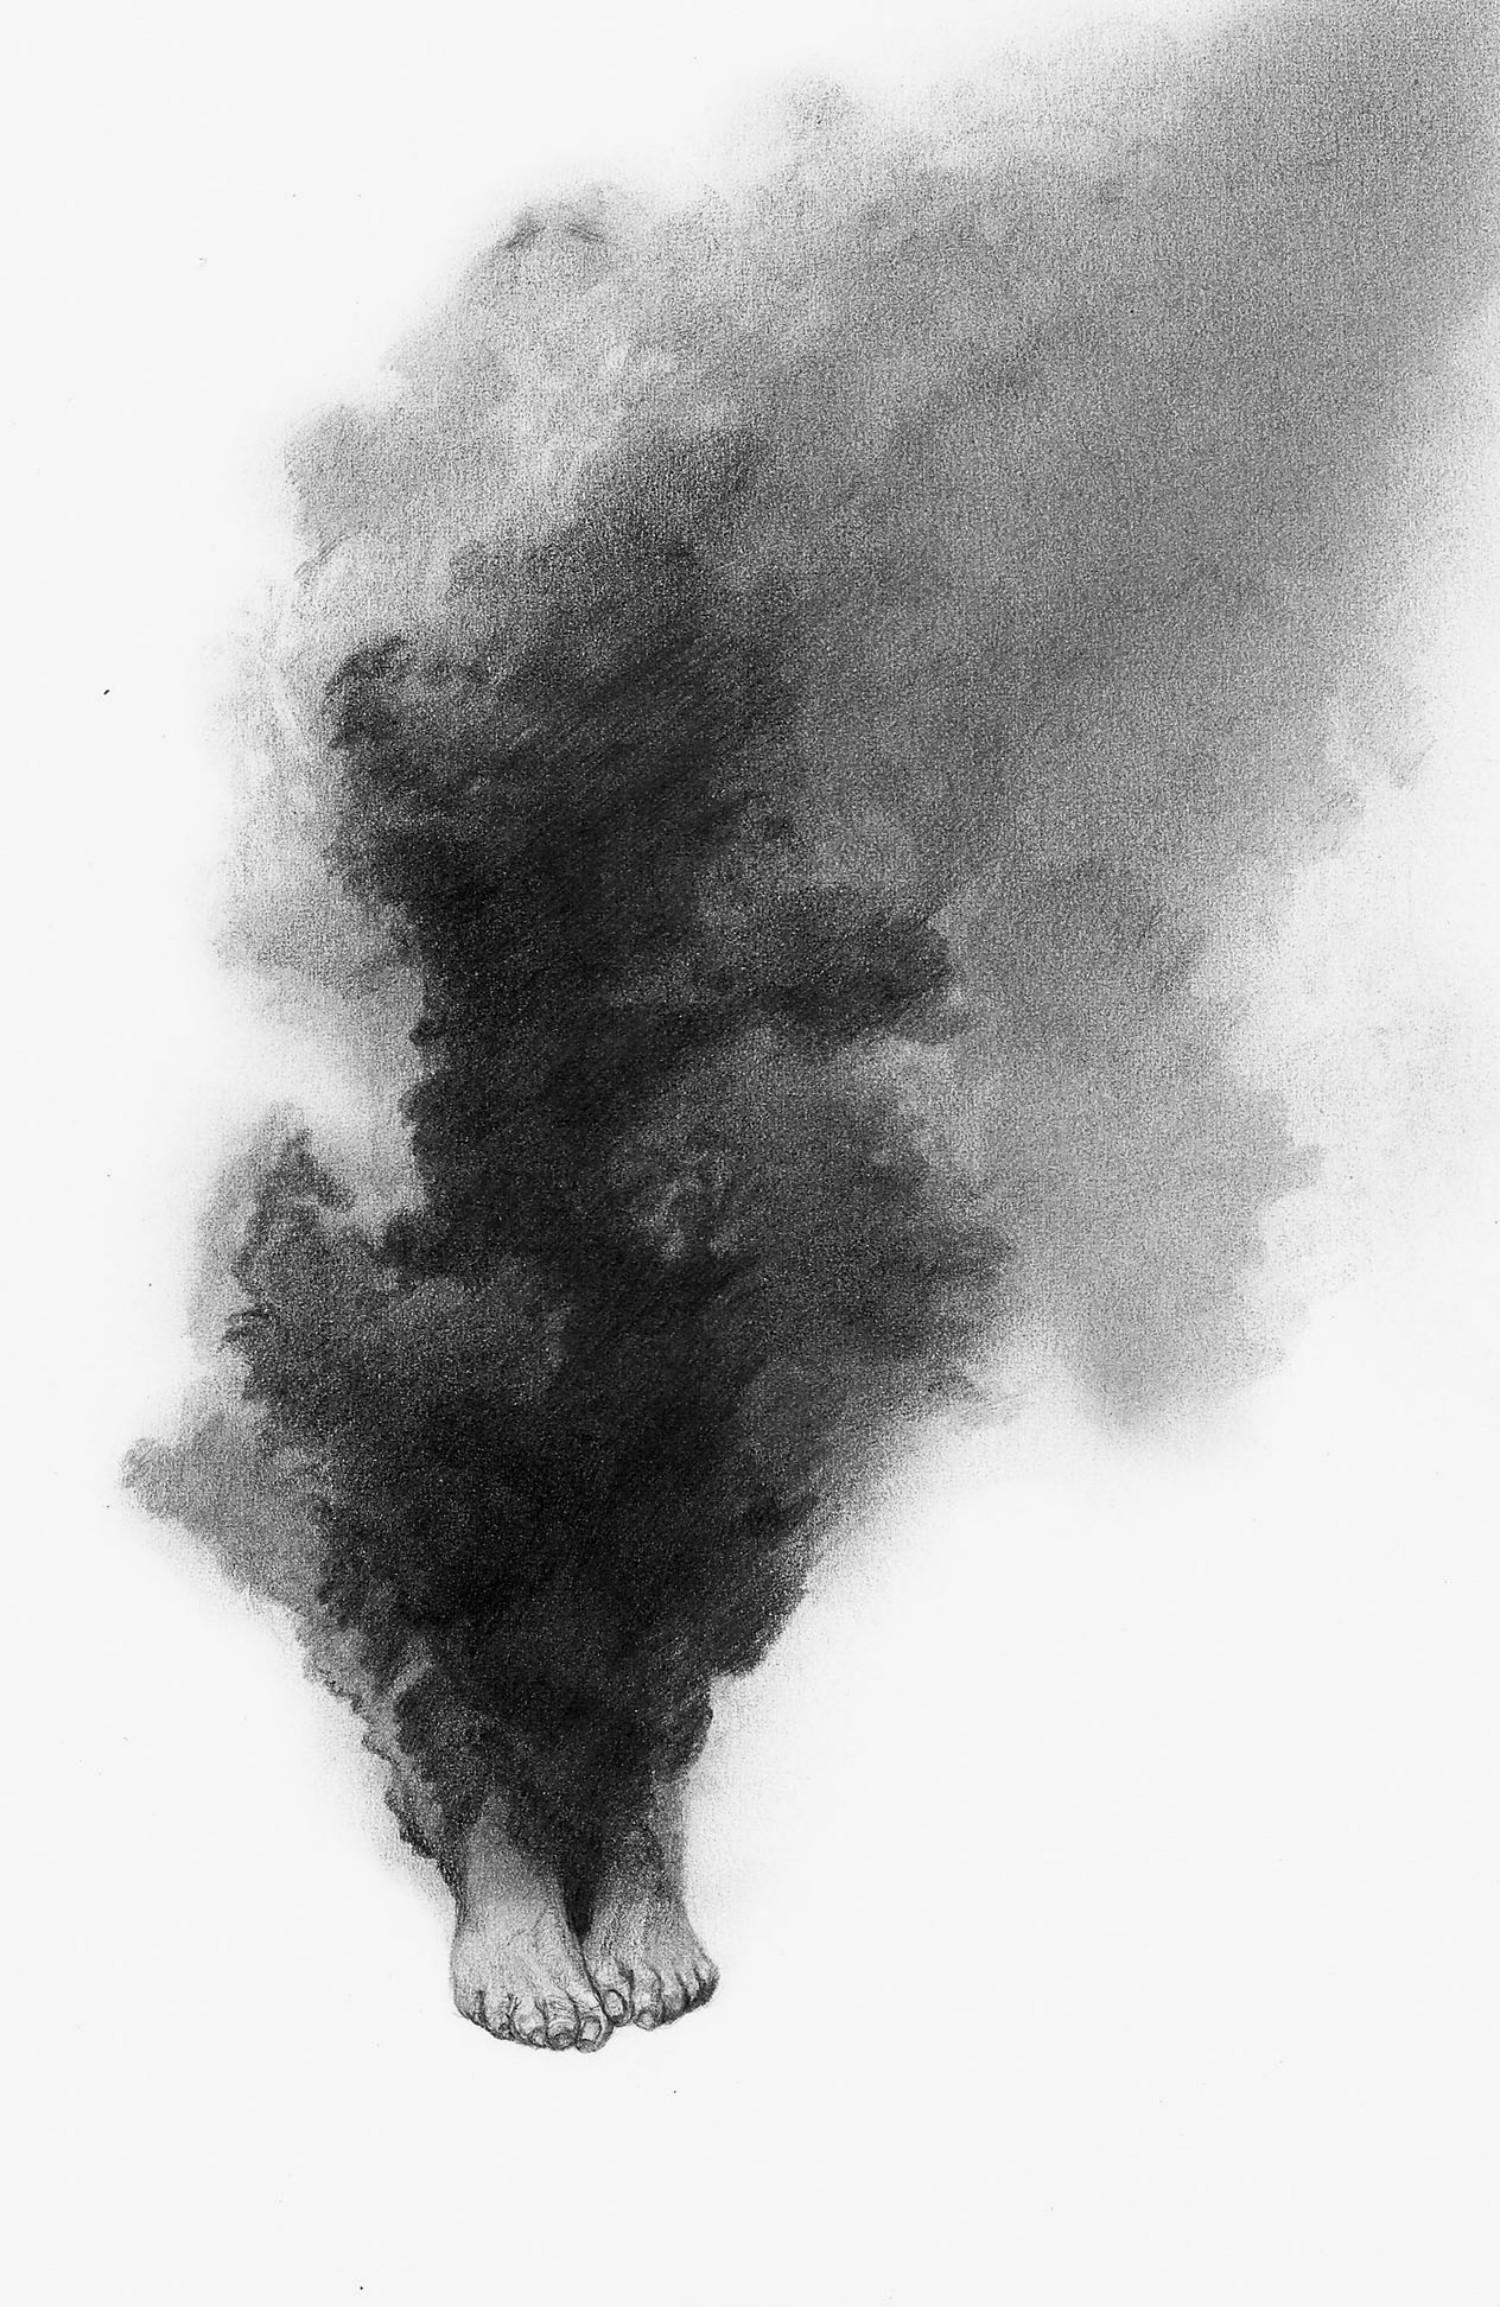 Alejandro García Restrepo illustration black white pencil smoke